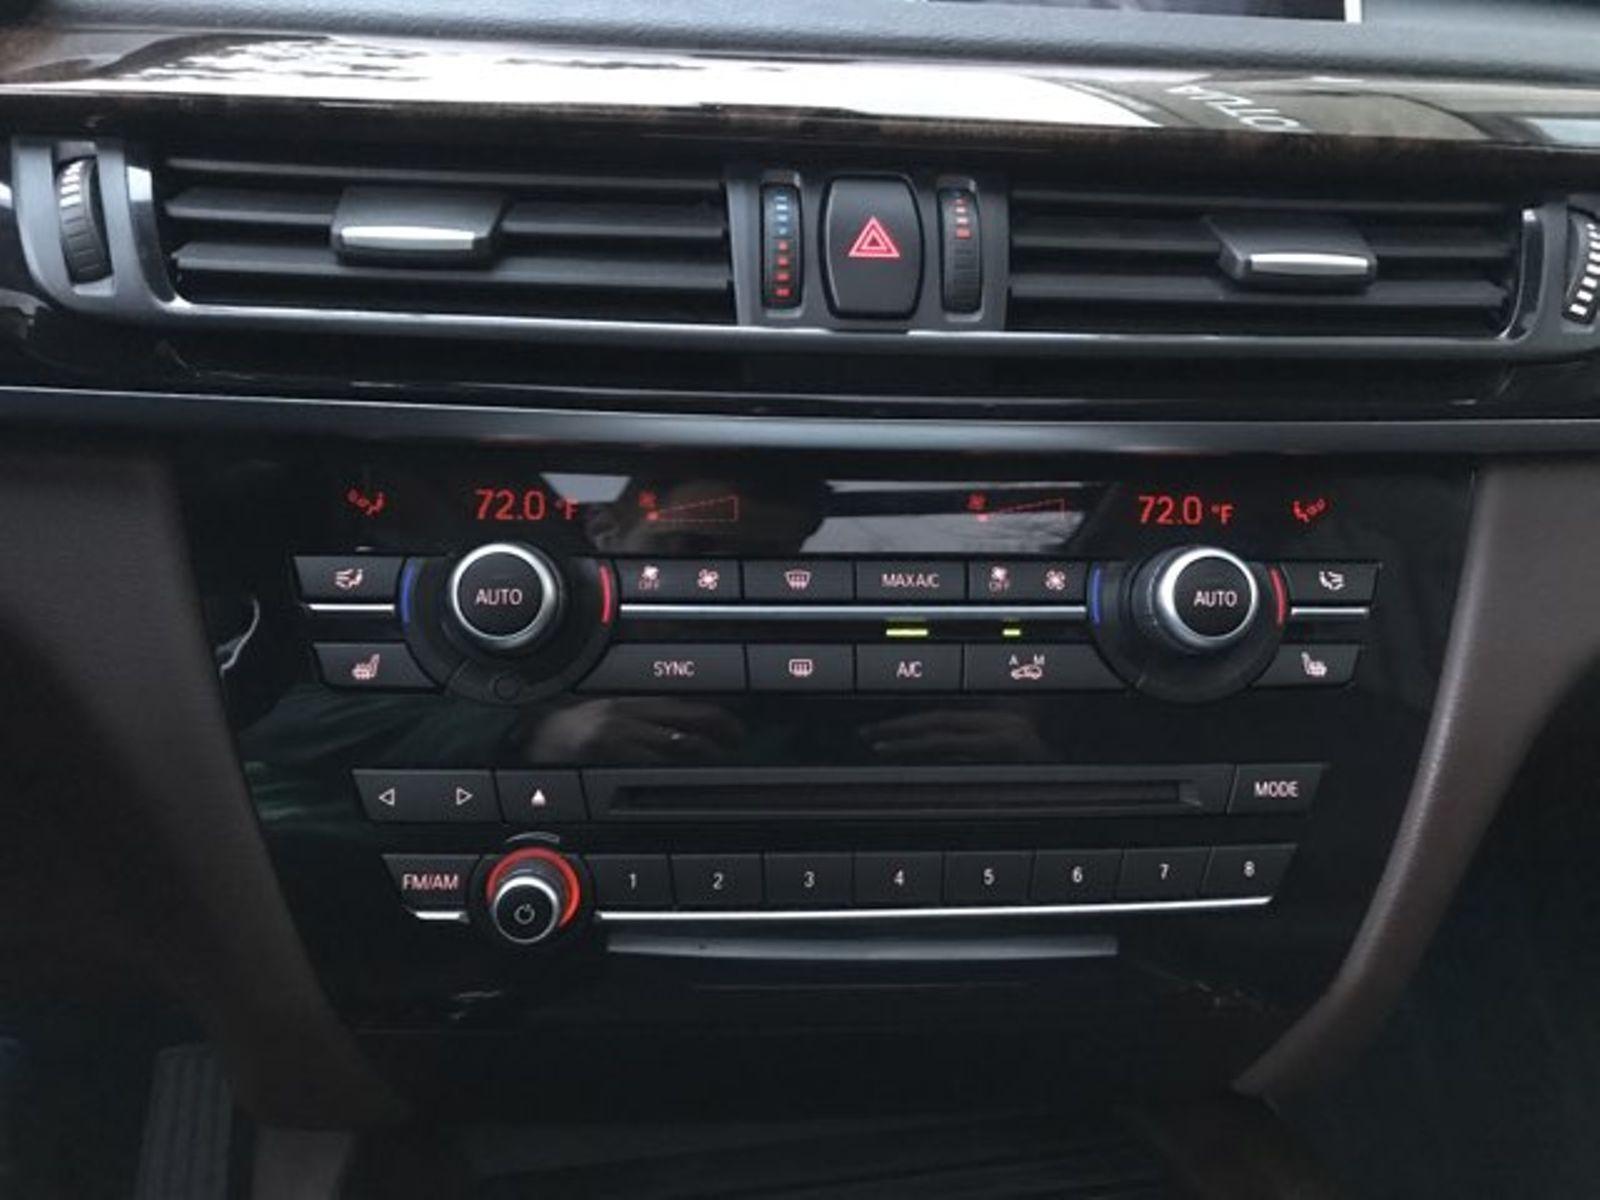 2015 BMW X5 xDrive35i 7 Passenger Seating Navigation Rear Camera